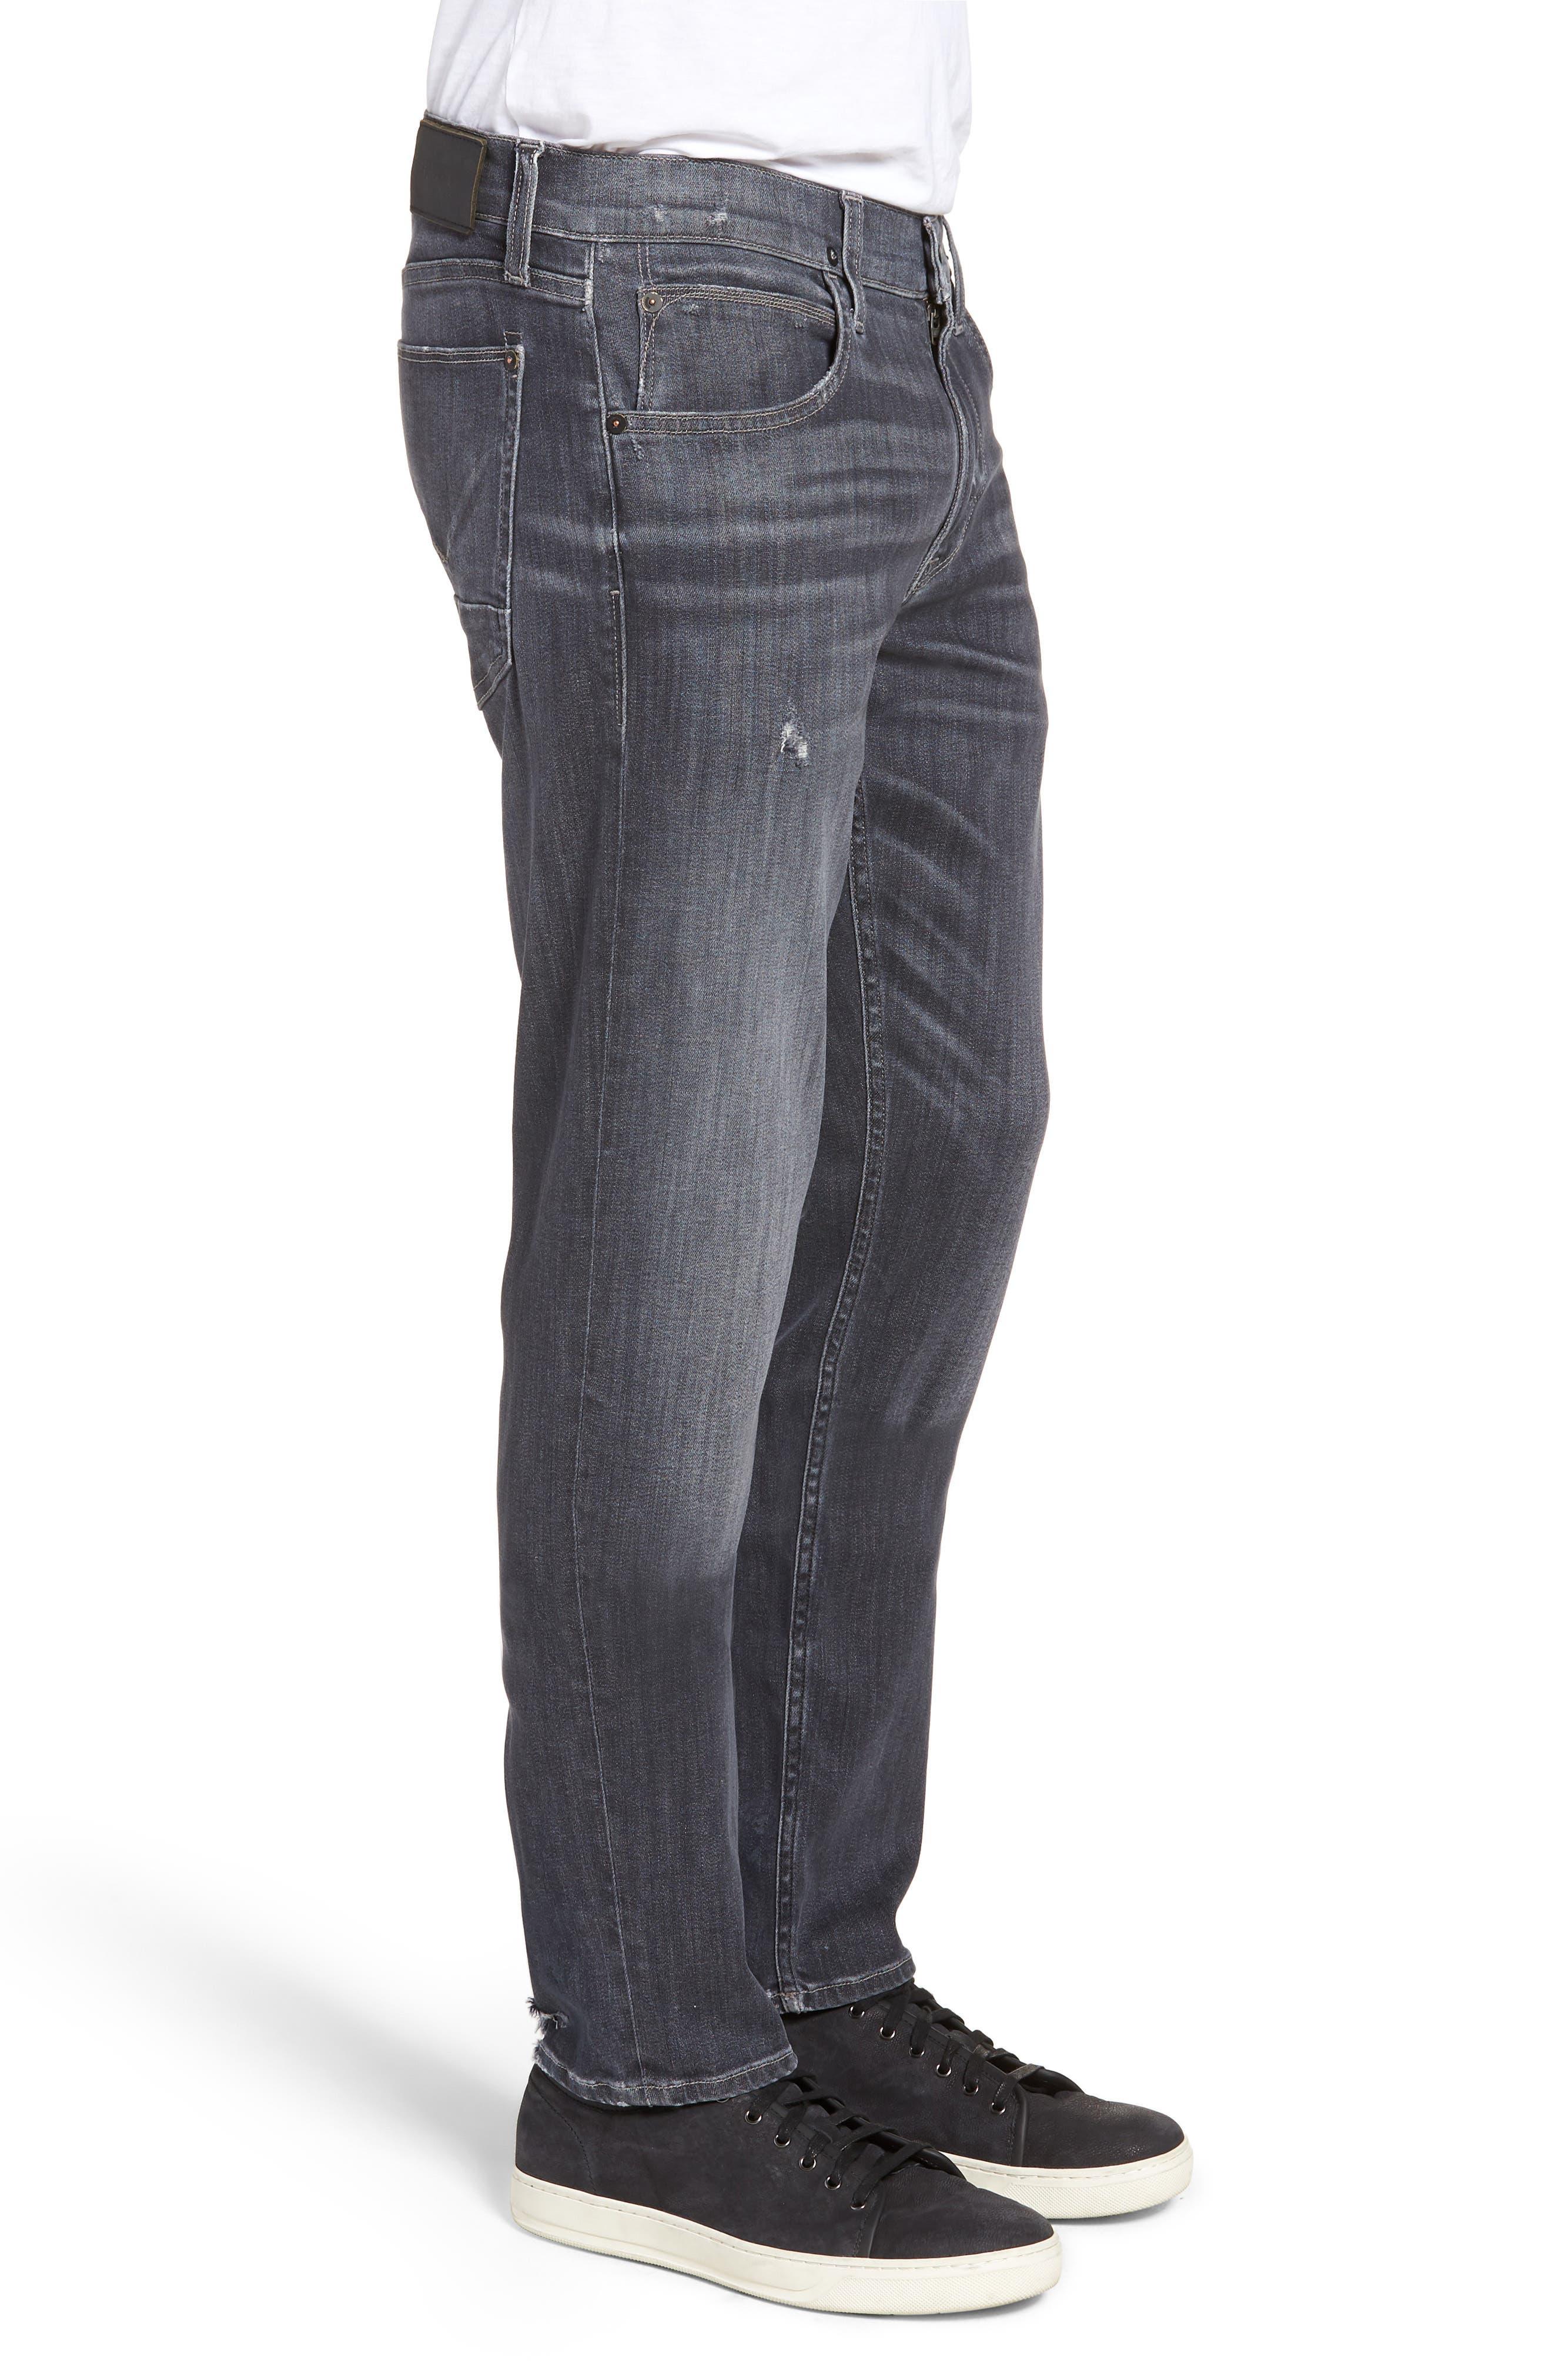 Blake Slim Fit Jeans,                             Alternate thumbnail 3, color,                             Silver Lake